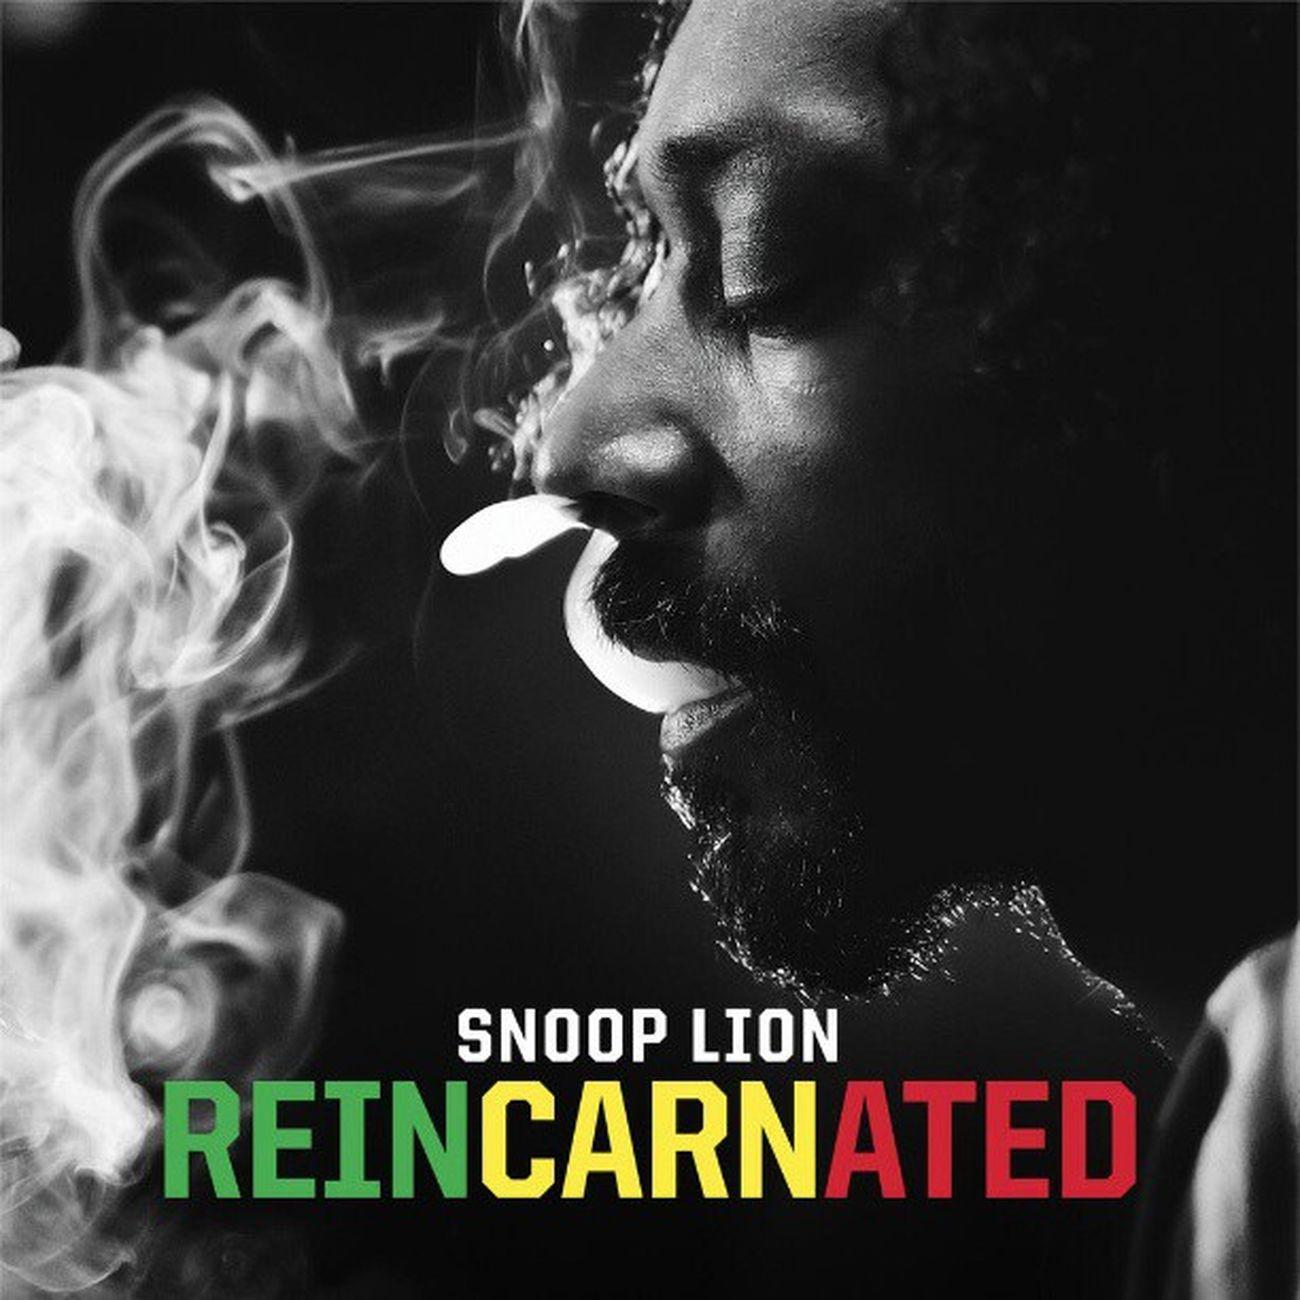 Snooplion Snoopdogg Reincanated Instamusic Reggae WTF unbonalbum sympatoch Weed Everyday SnoopDoggyDogg